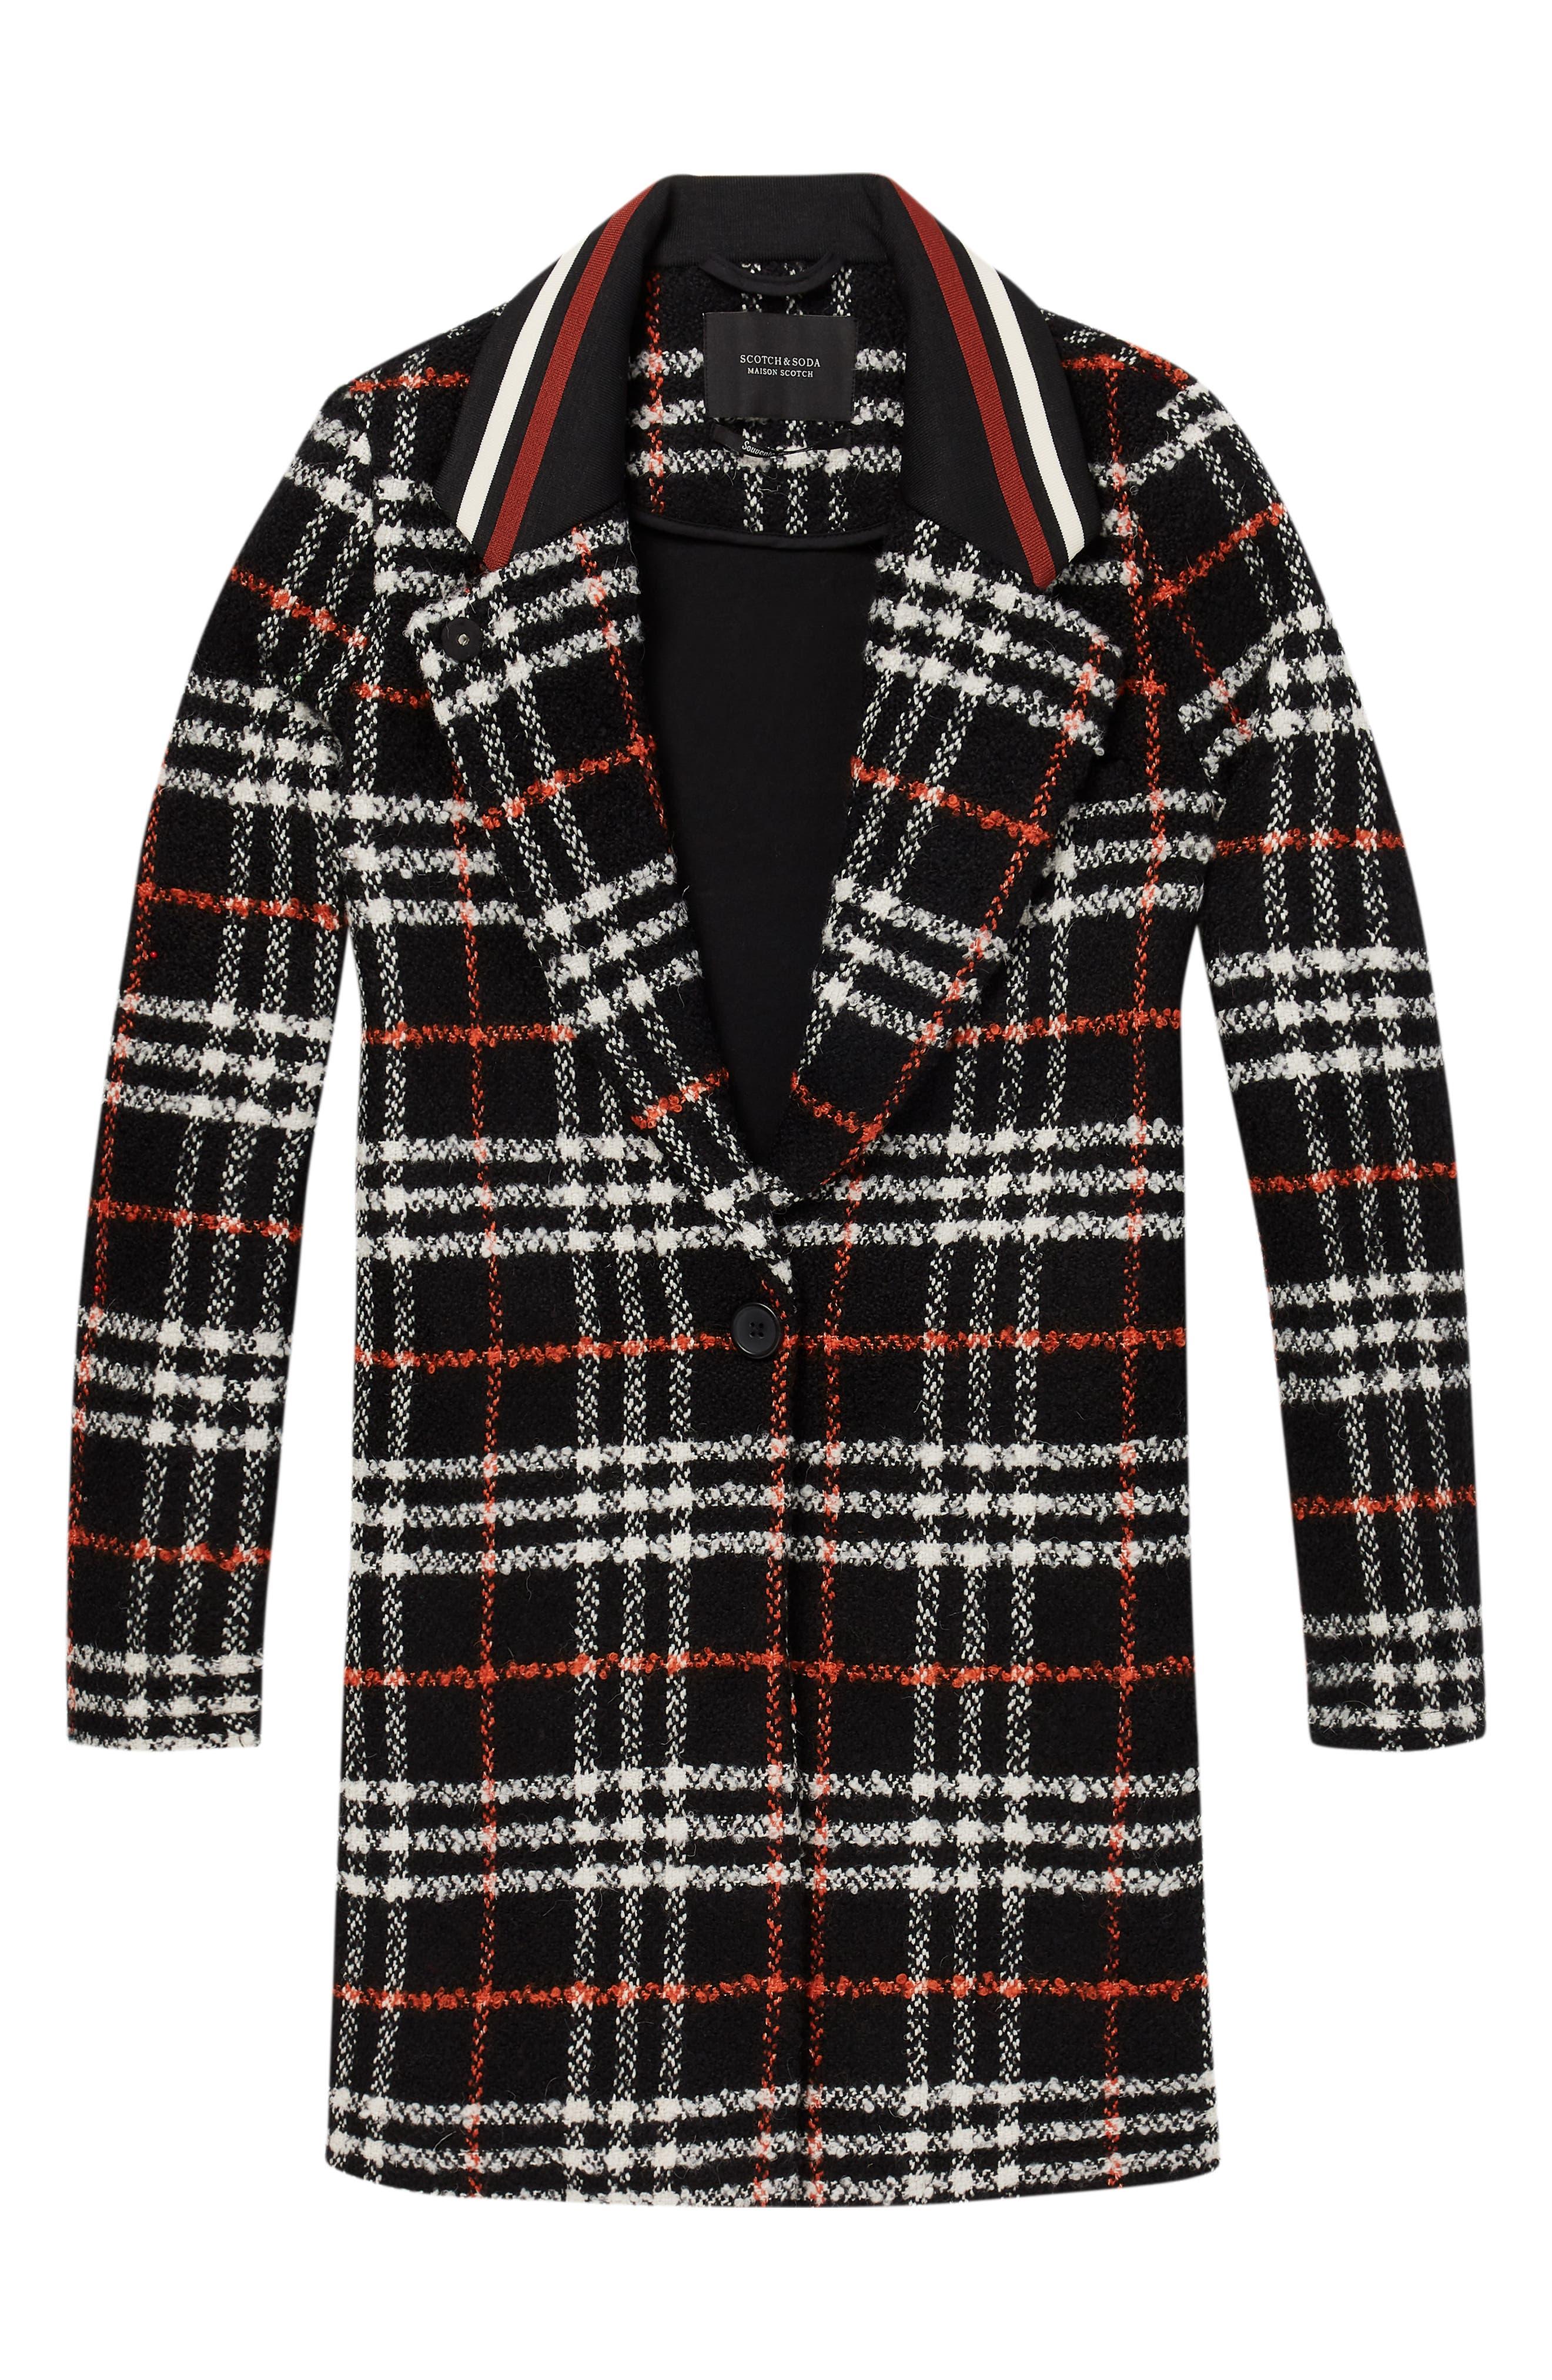 Bonded Wool Blend Jacket,                             Alternate thumbnail 3, color,                             001